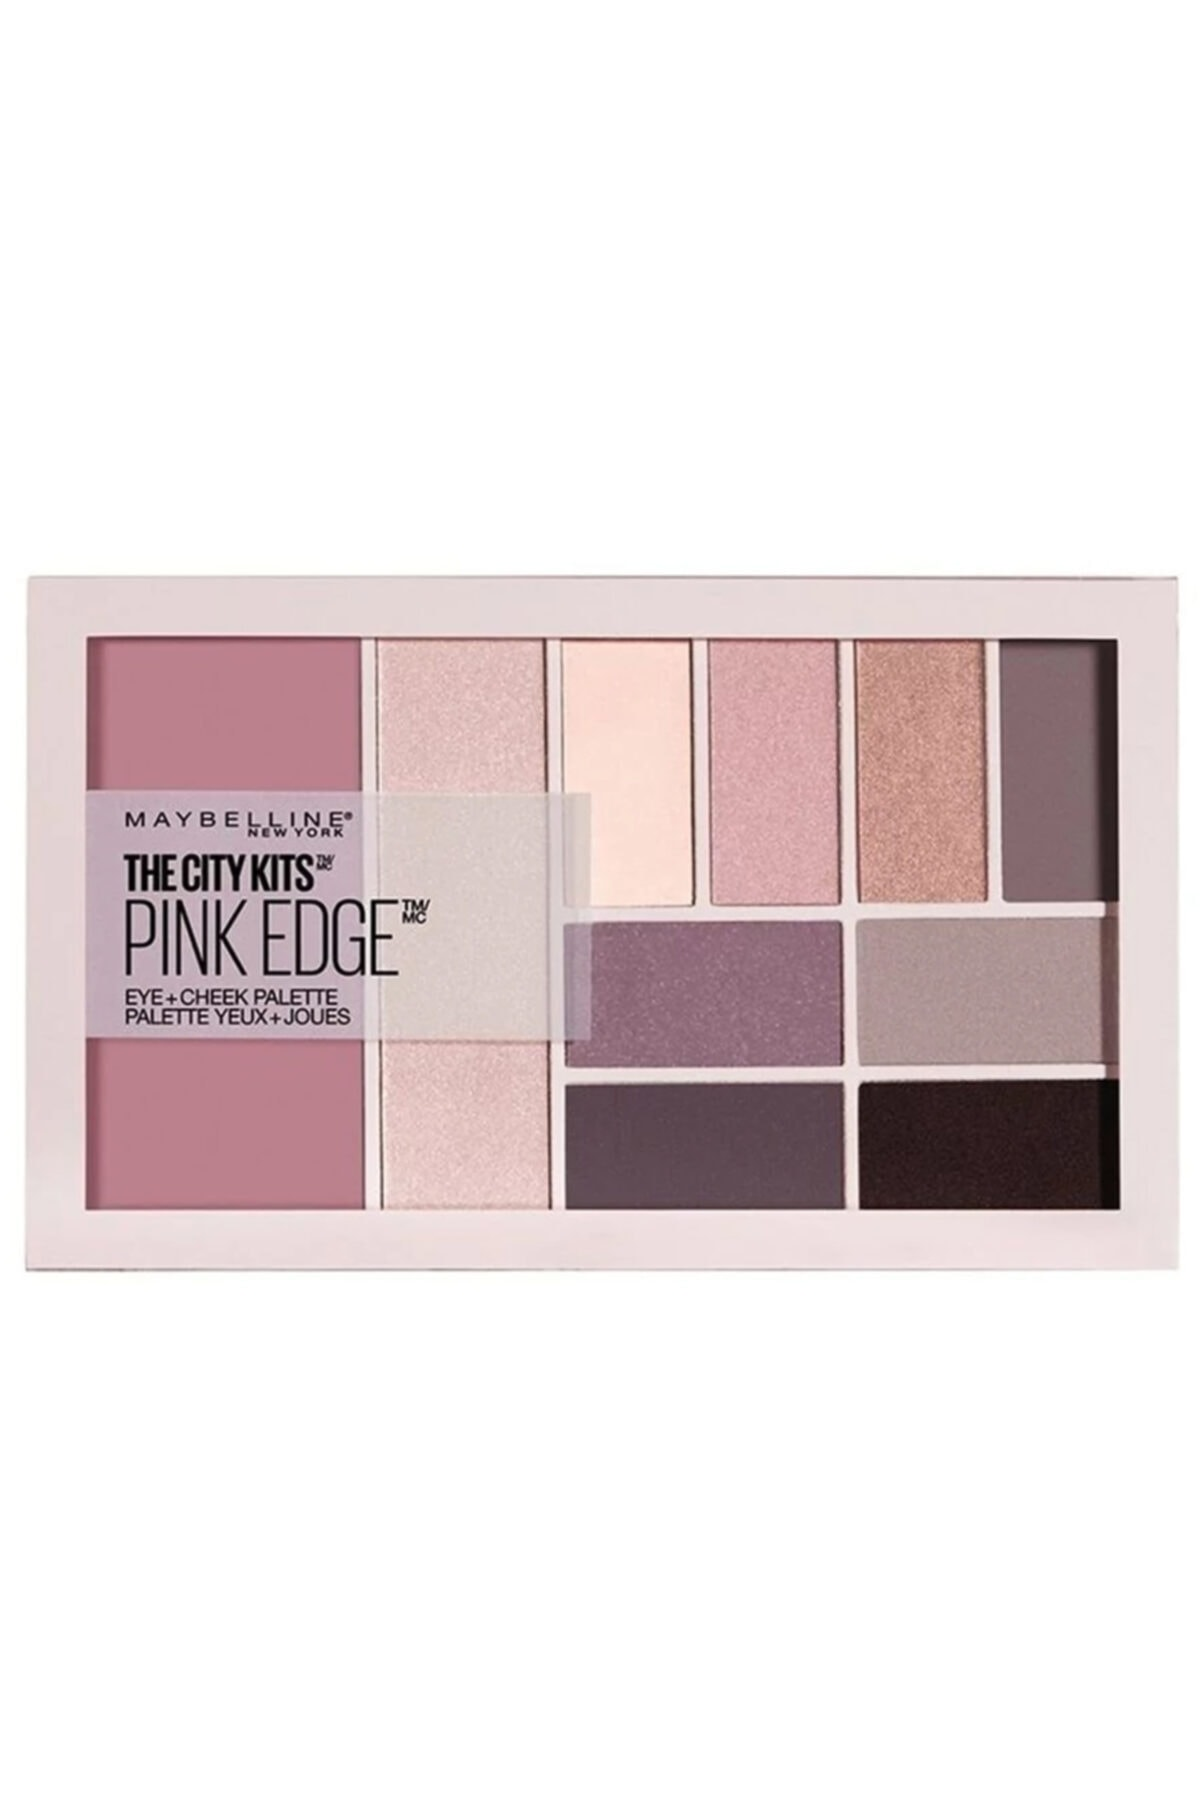 Maybelline New York Göz ve Ten Paleti - The City Kits Pallette Pink Edge 3600531434632 1